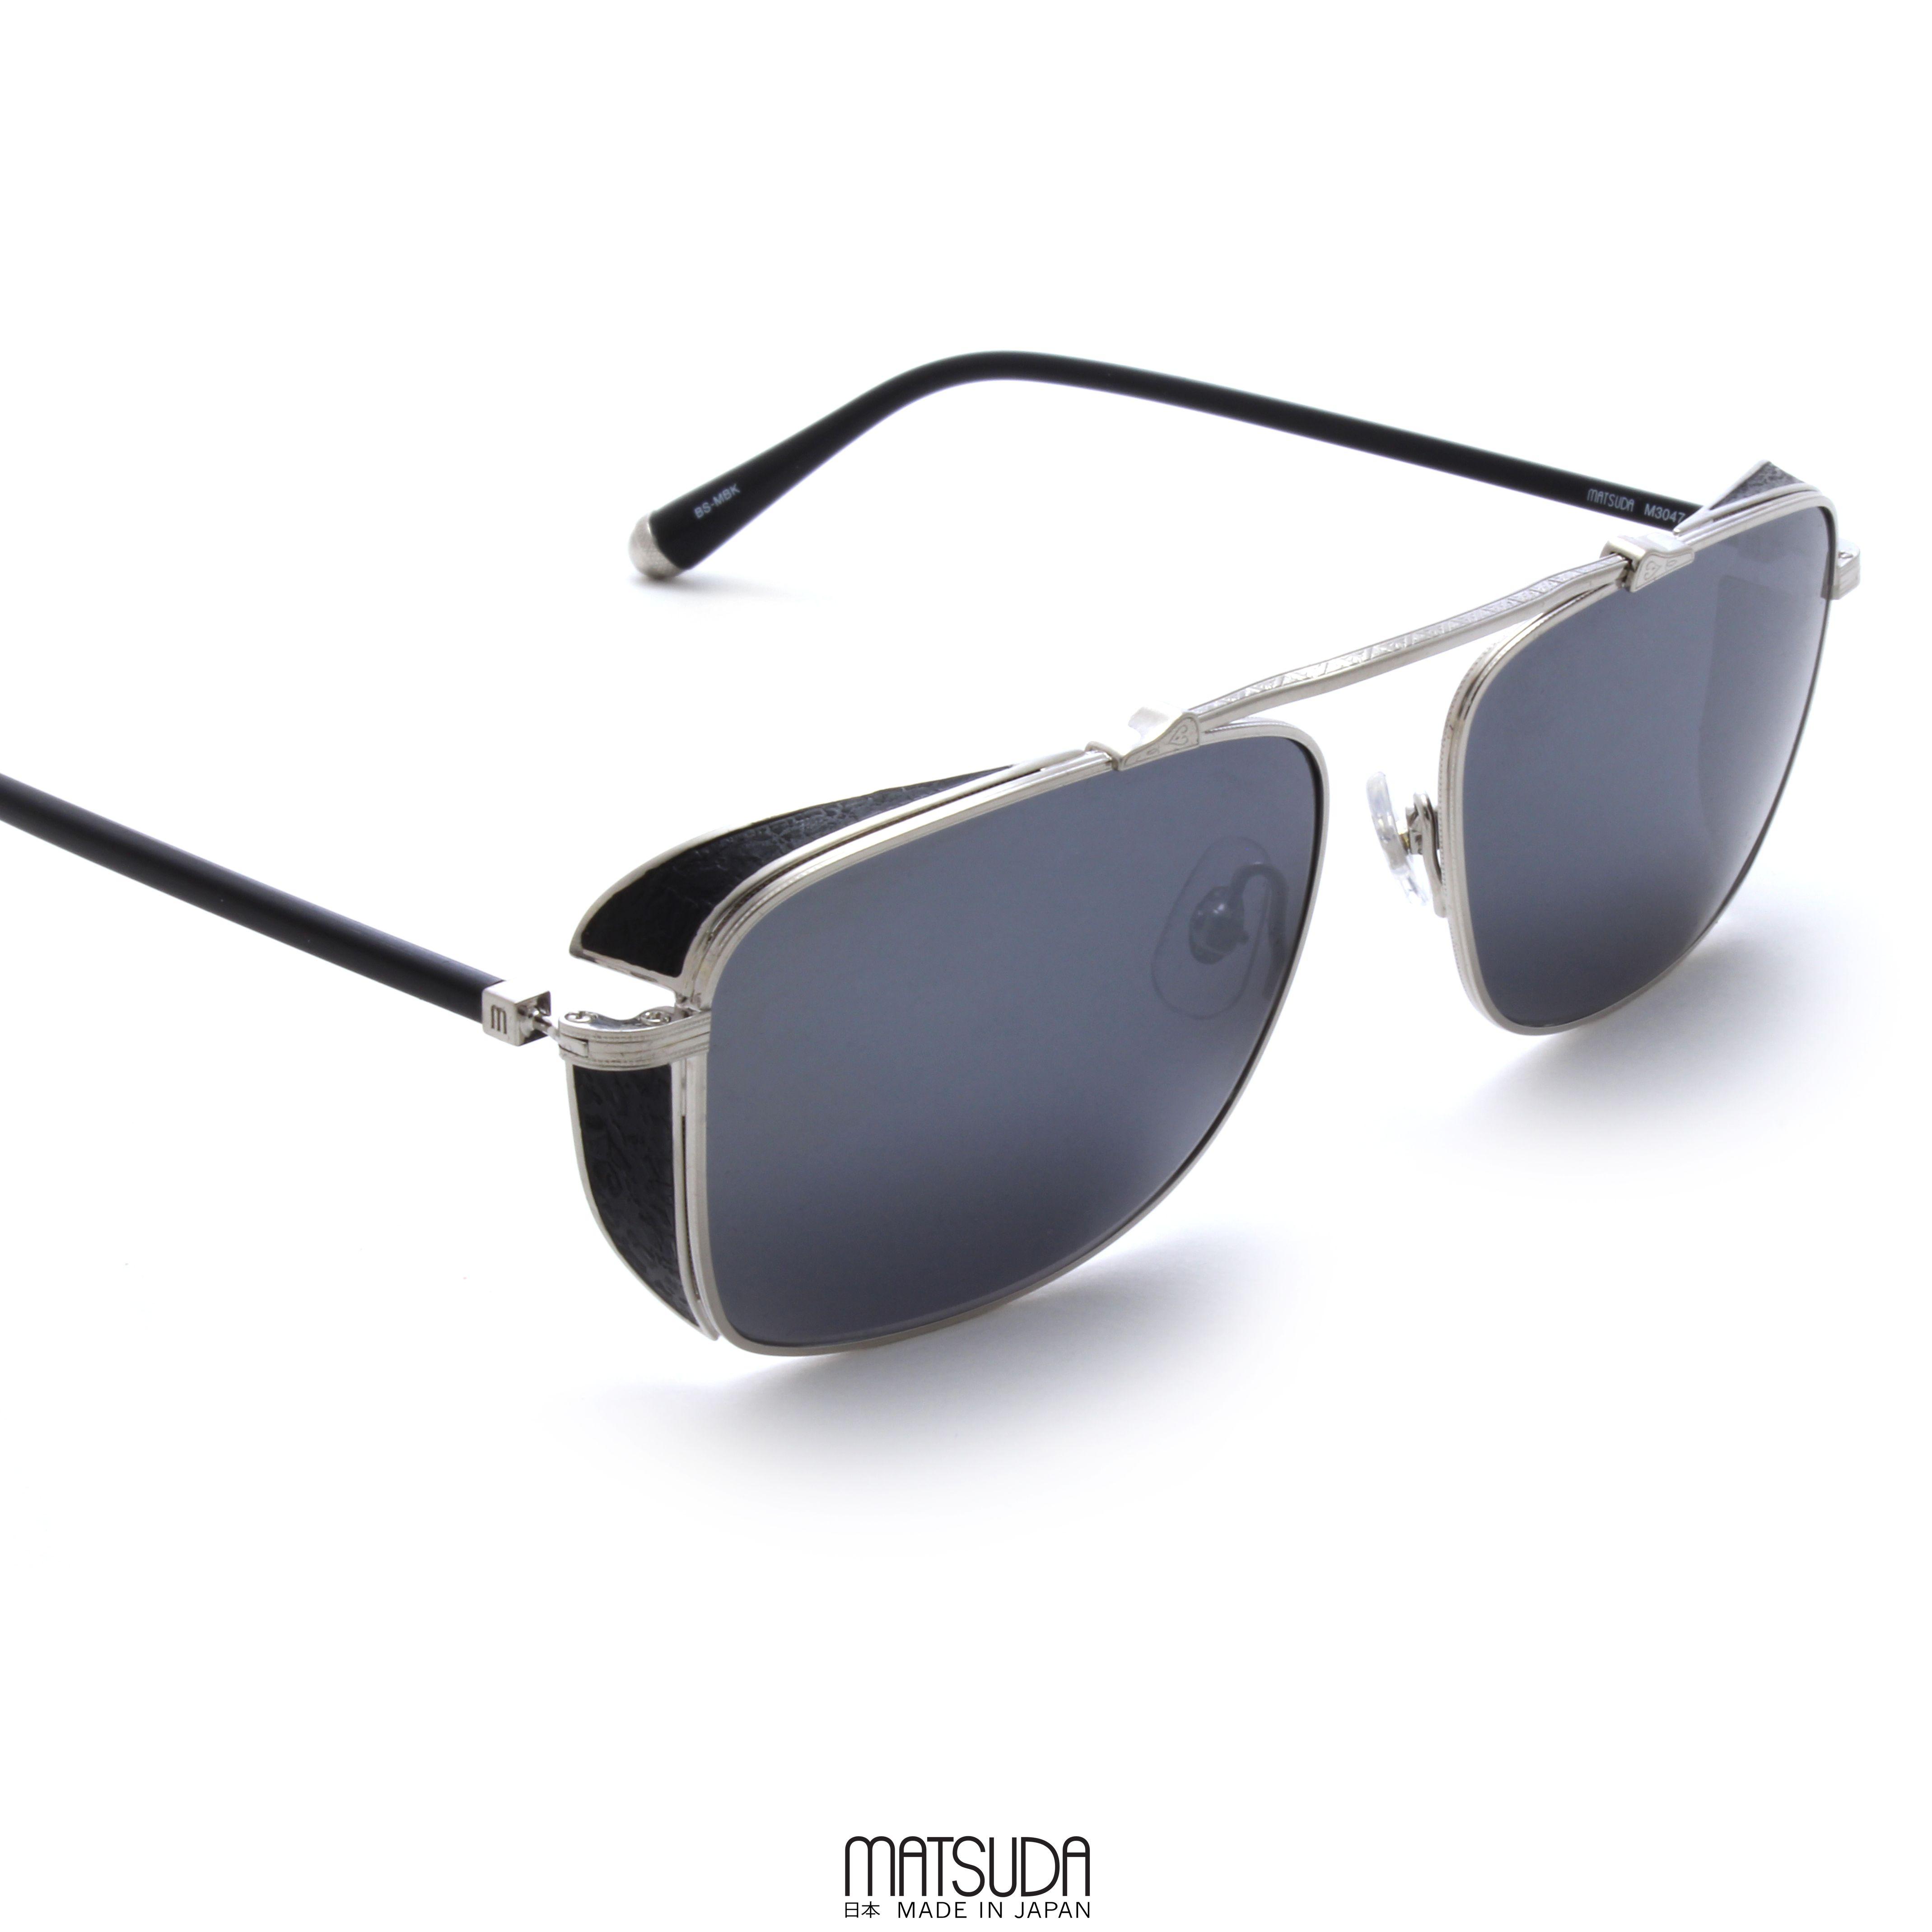 c85916f3569 The MATSUDA EYEWEAR    M3047 is a rare design in modern eyewear constructed  of aged